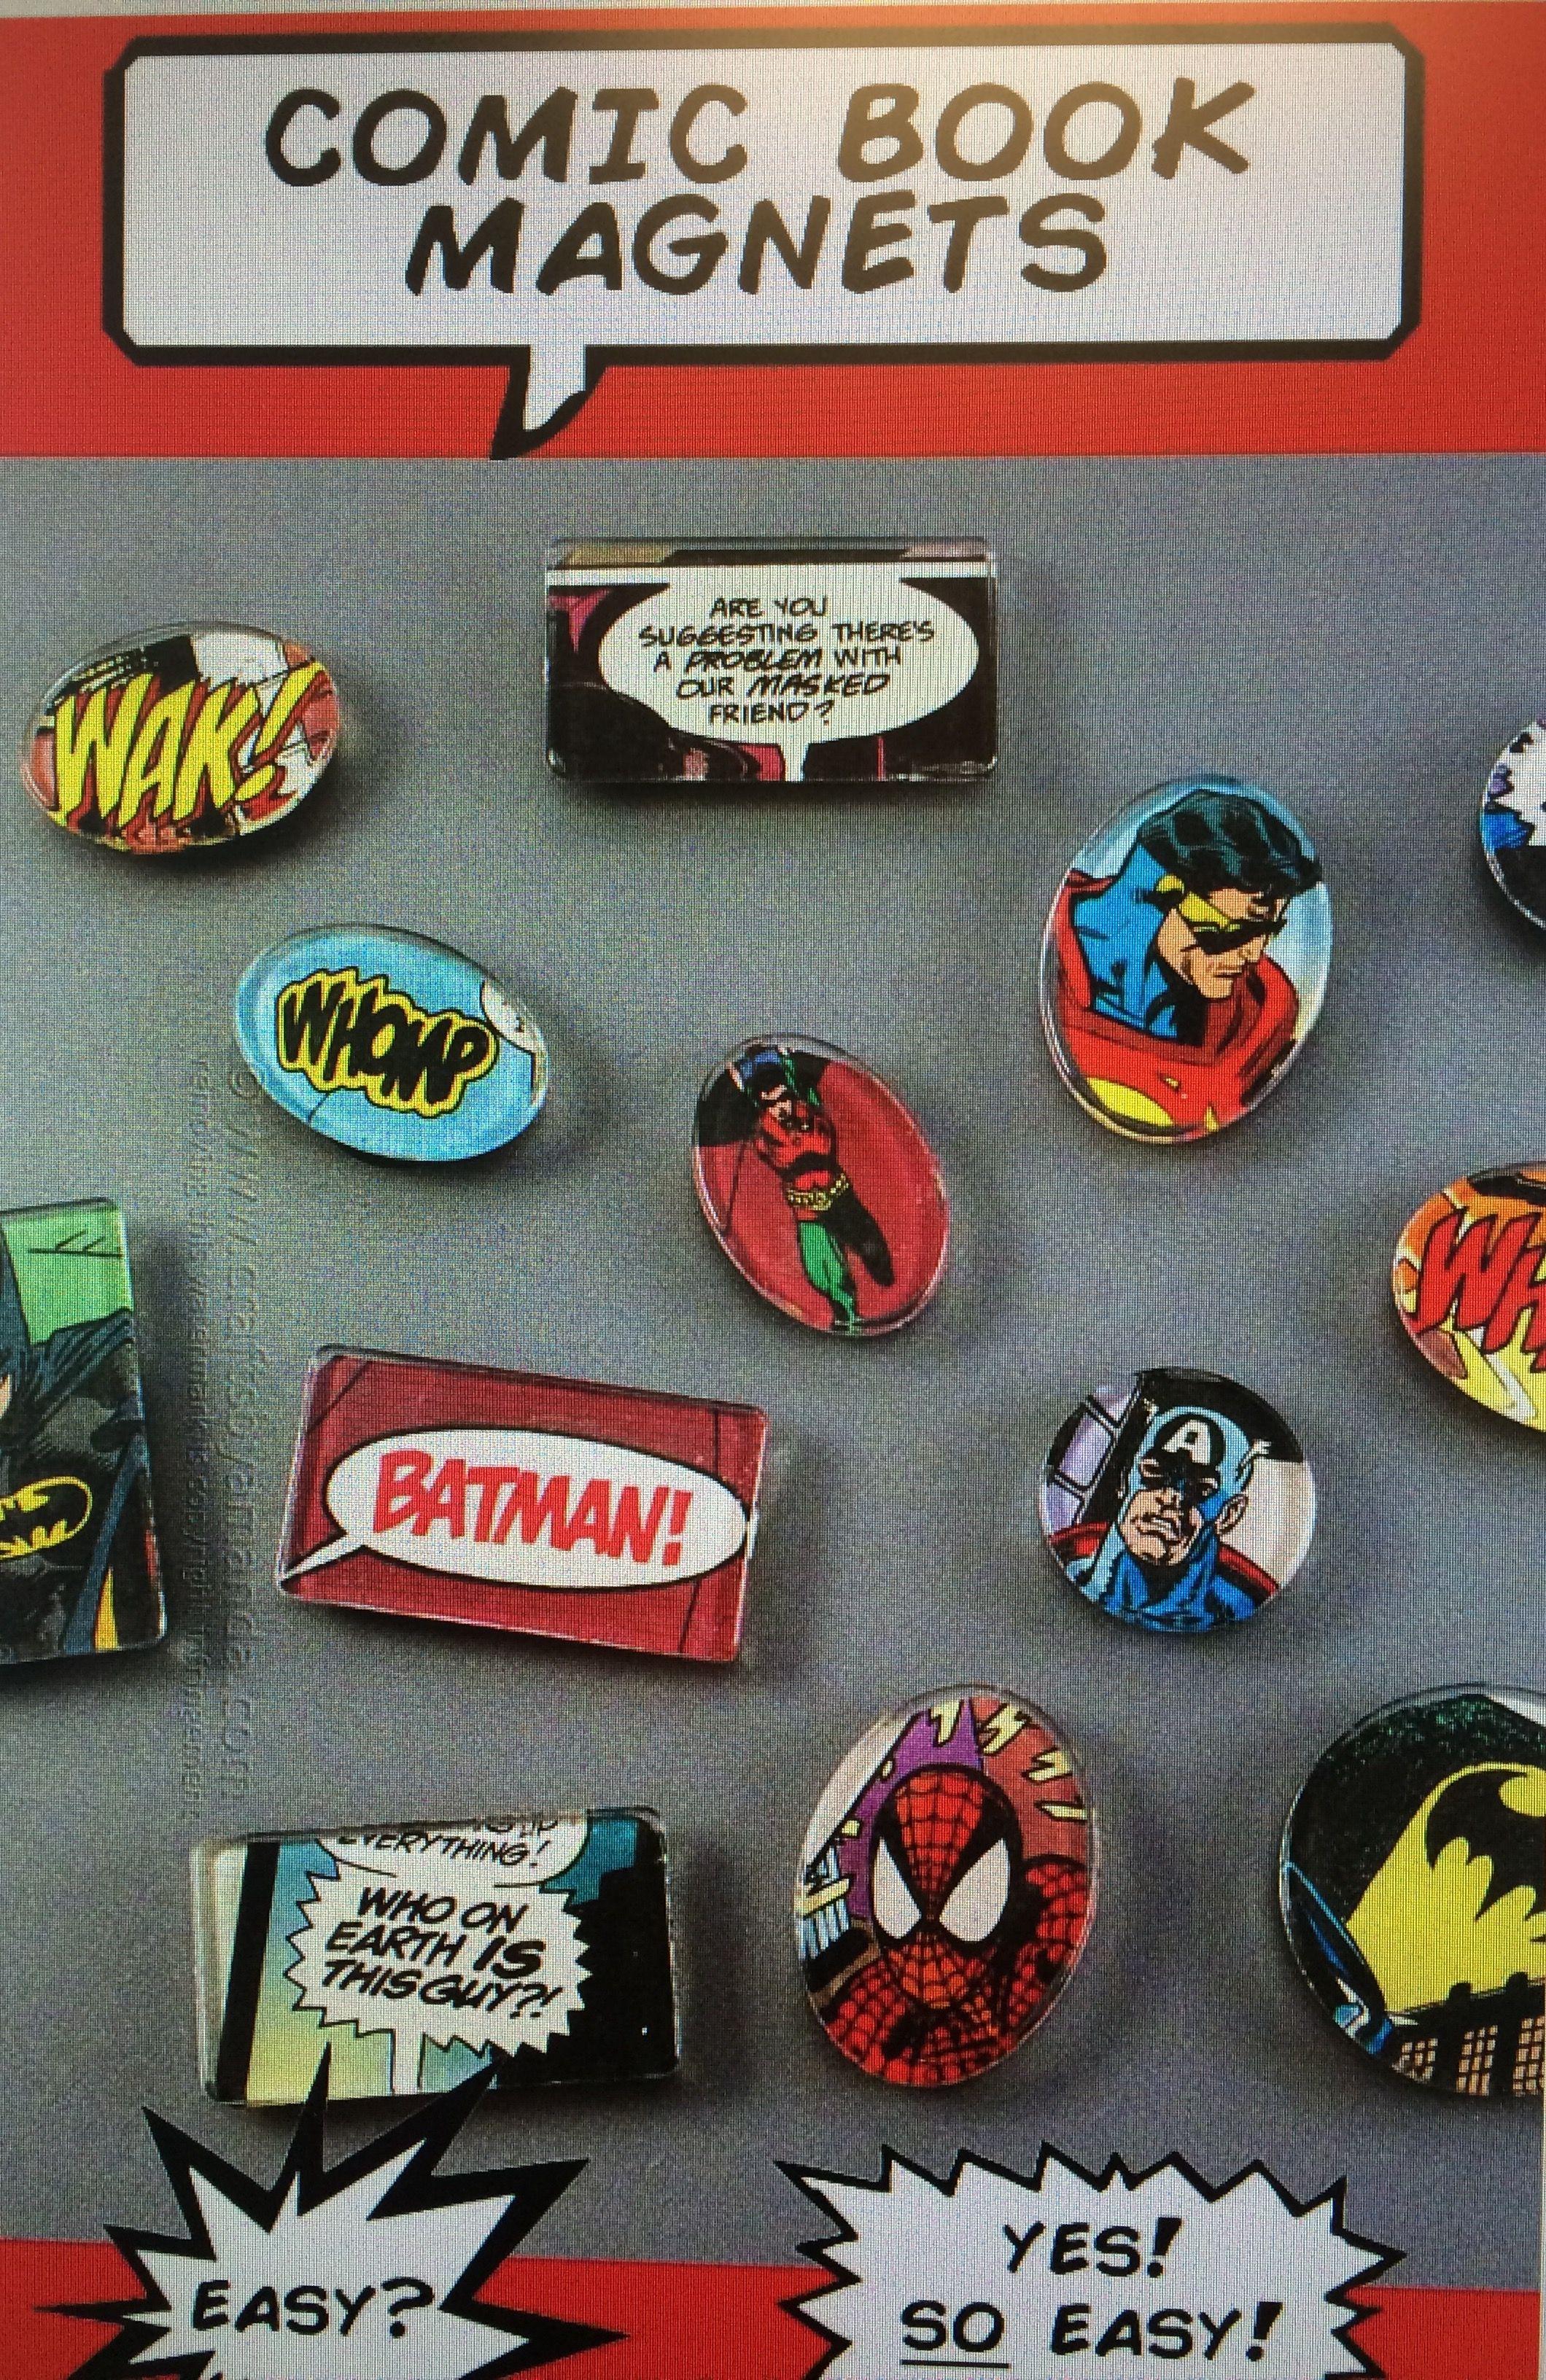 Pin by Delaney Lane on Crafts | Hero crafts, Comic book